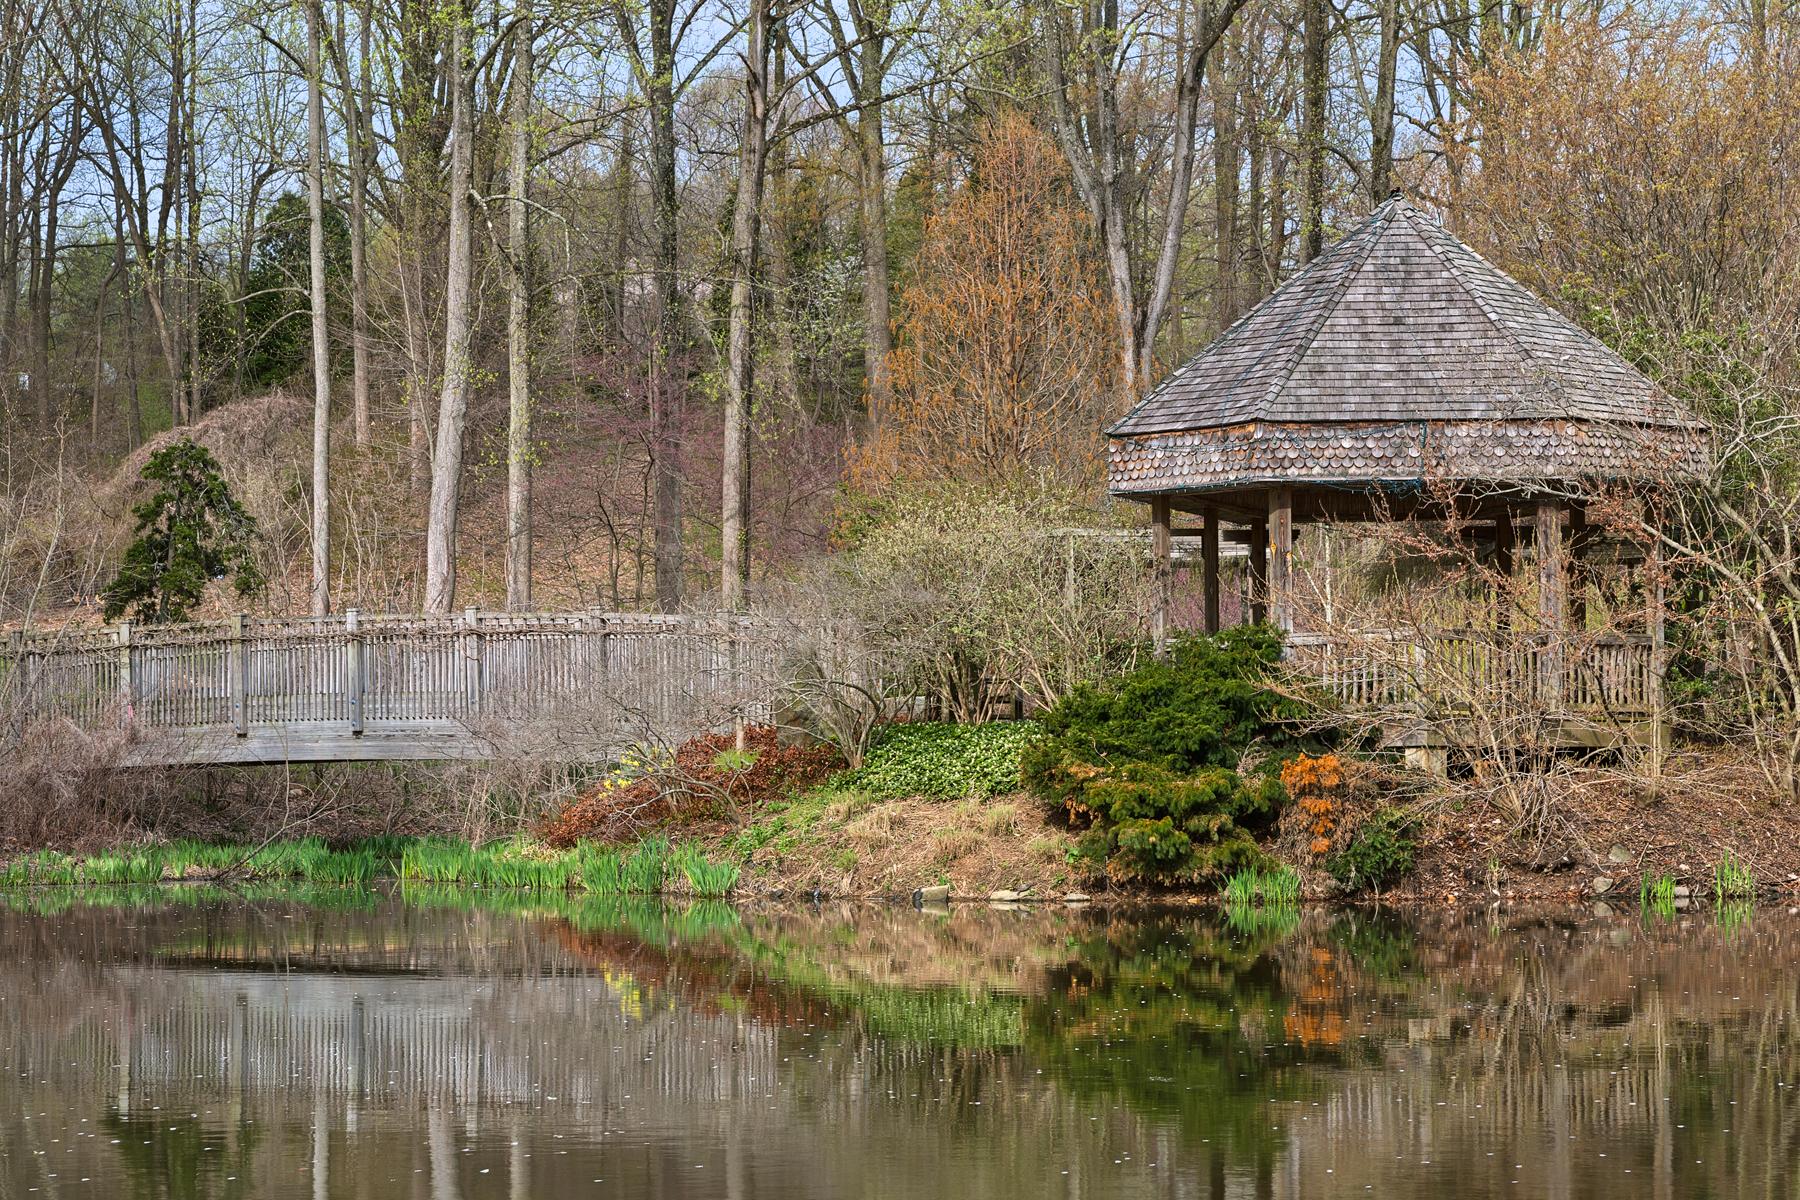 Brookside Bridge & Gazebo - HDR, America, Reflected, Serenity, Serene, HQ Photo